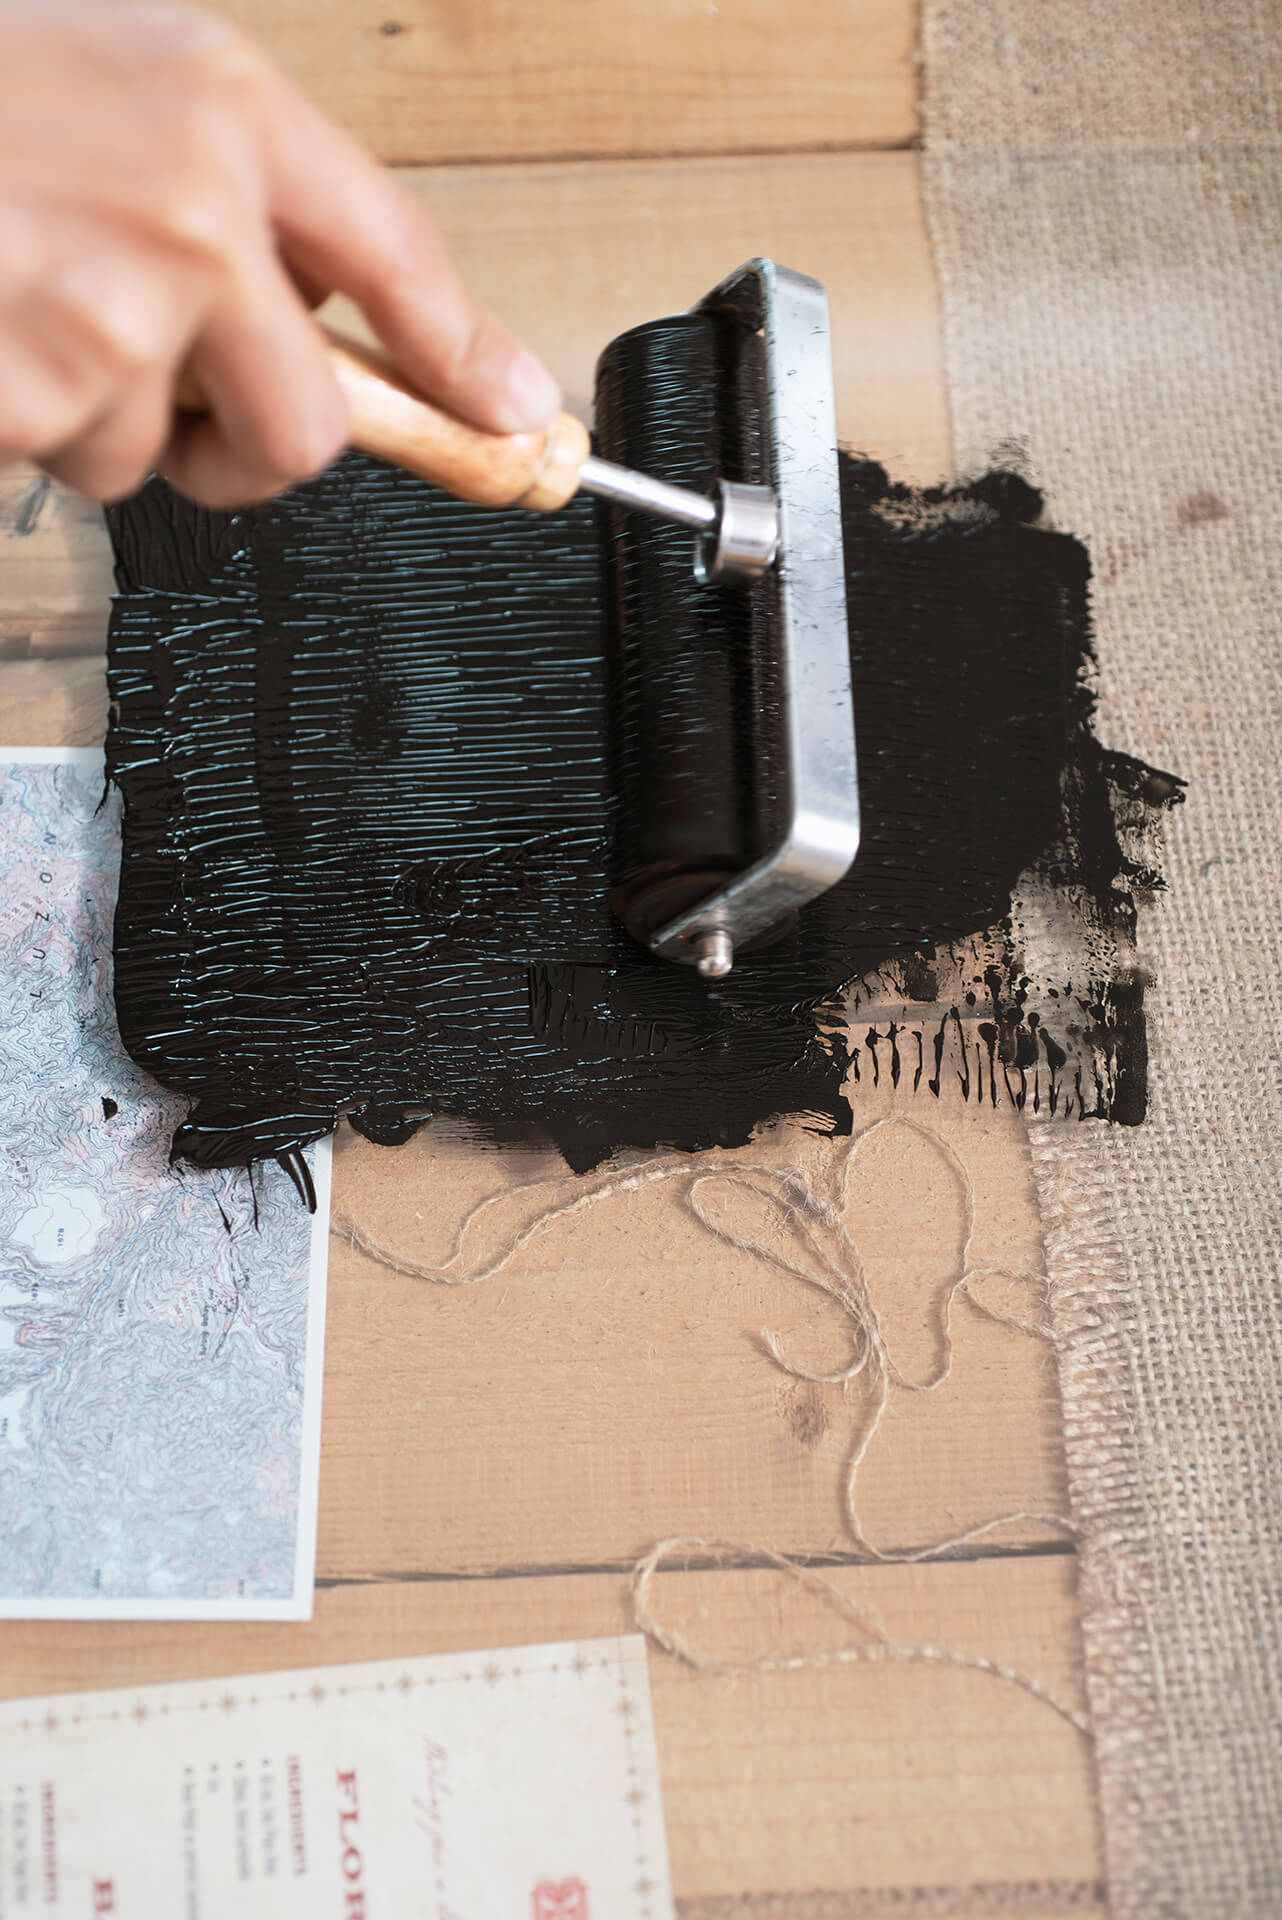 Details of ink used in relief printmaking